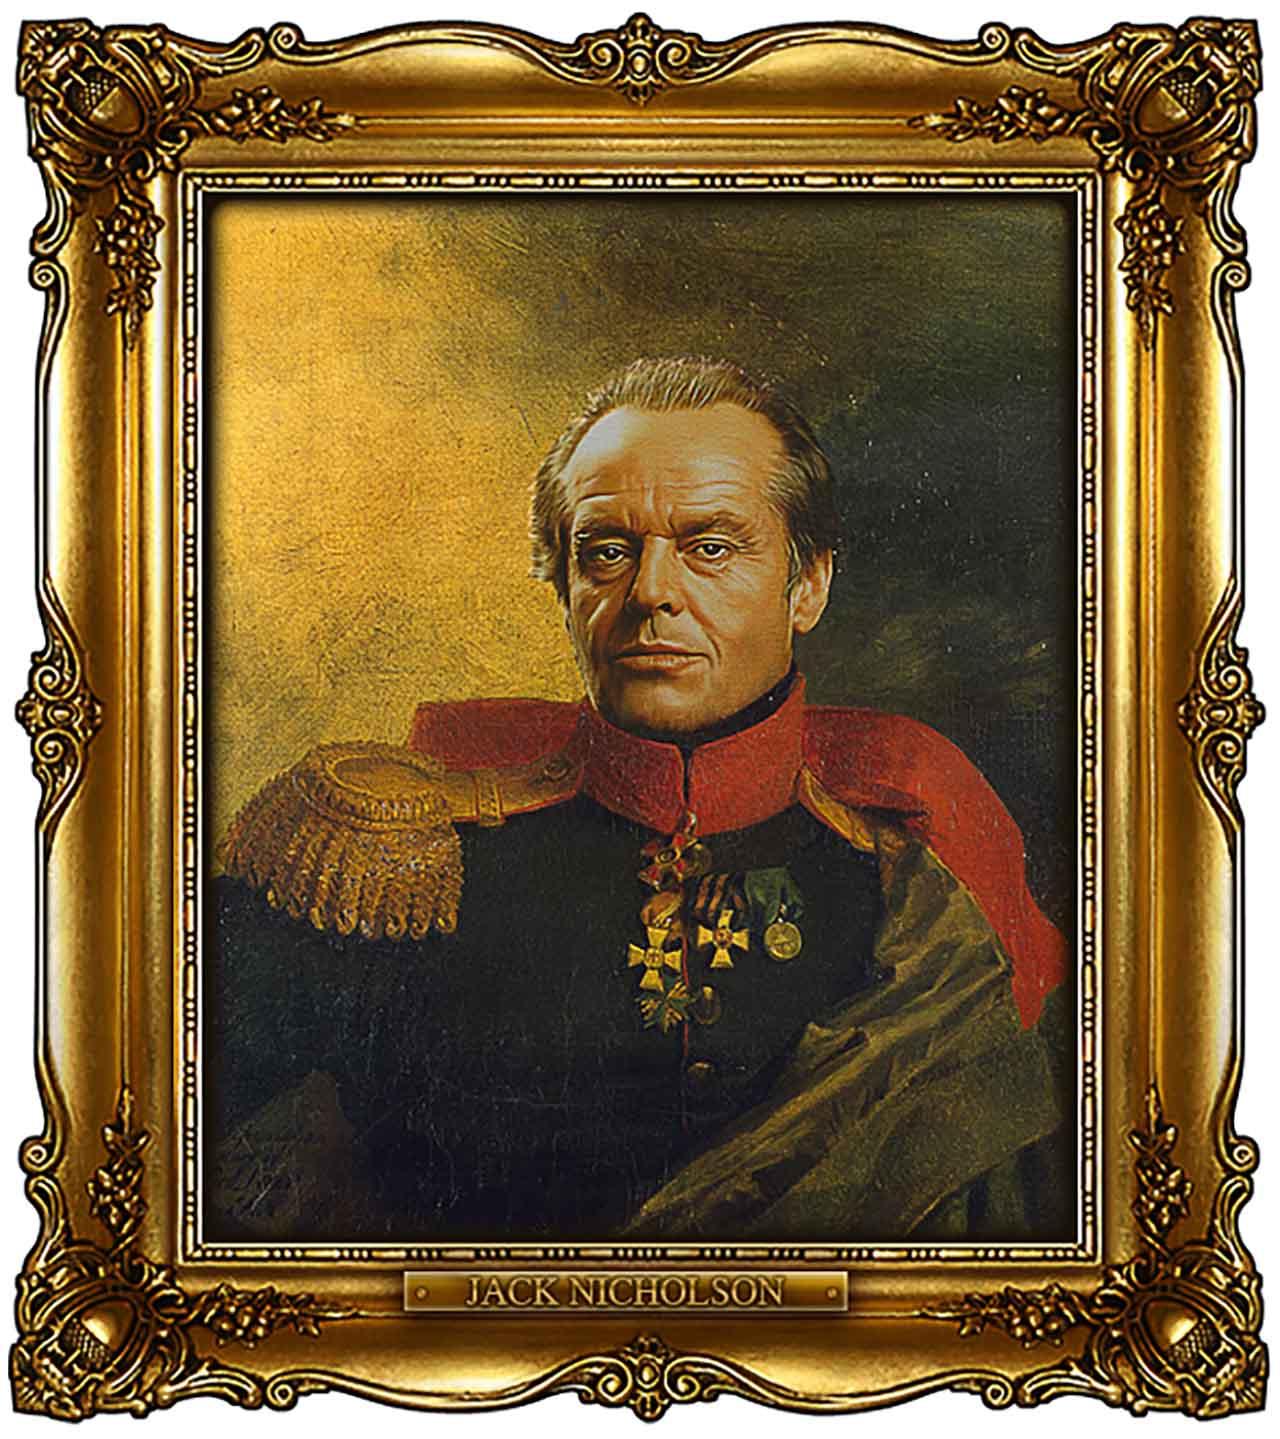 Artist Turns Famous Actors Into Russian Generals - Jack Nicholson